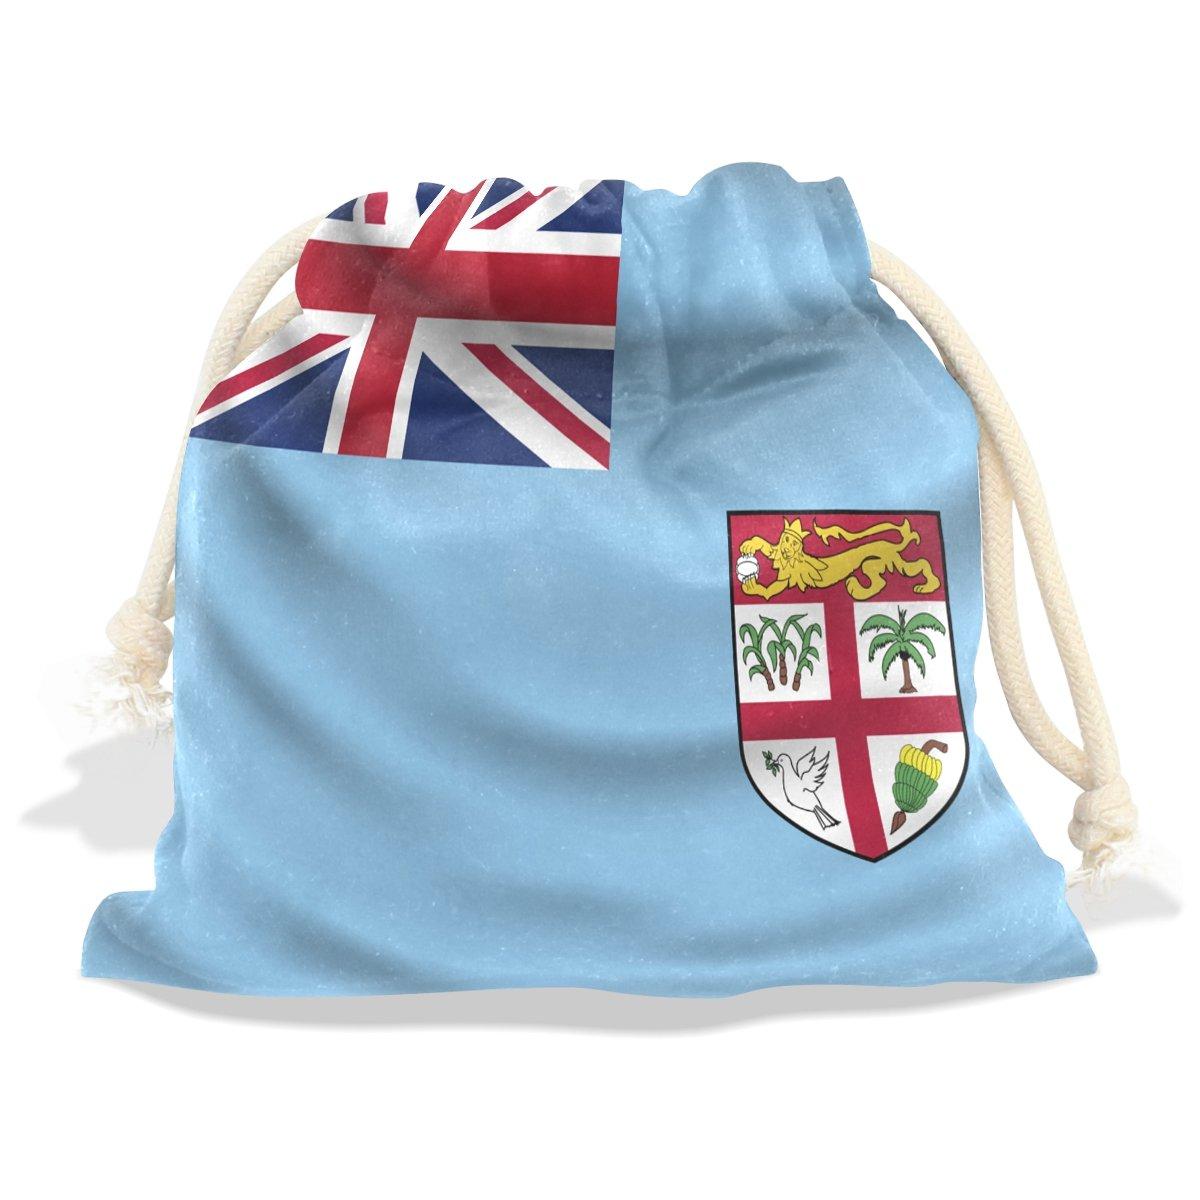 super3Dprinted Fiji Flag Velvet Drawstring Gift Bag Wrap Present Pouch Favor for Party Game Wedding, Multiple Sizes Available